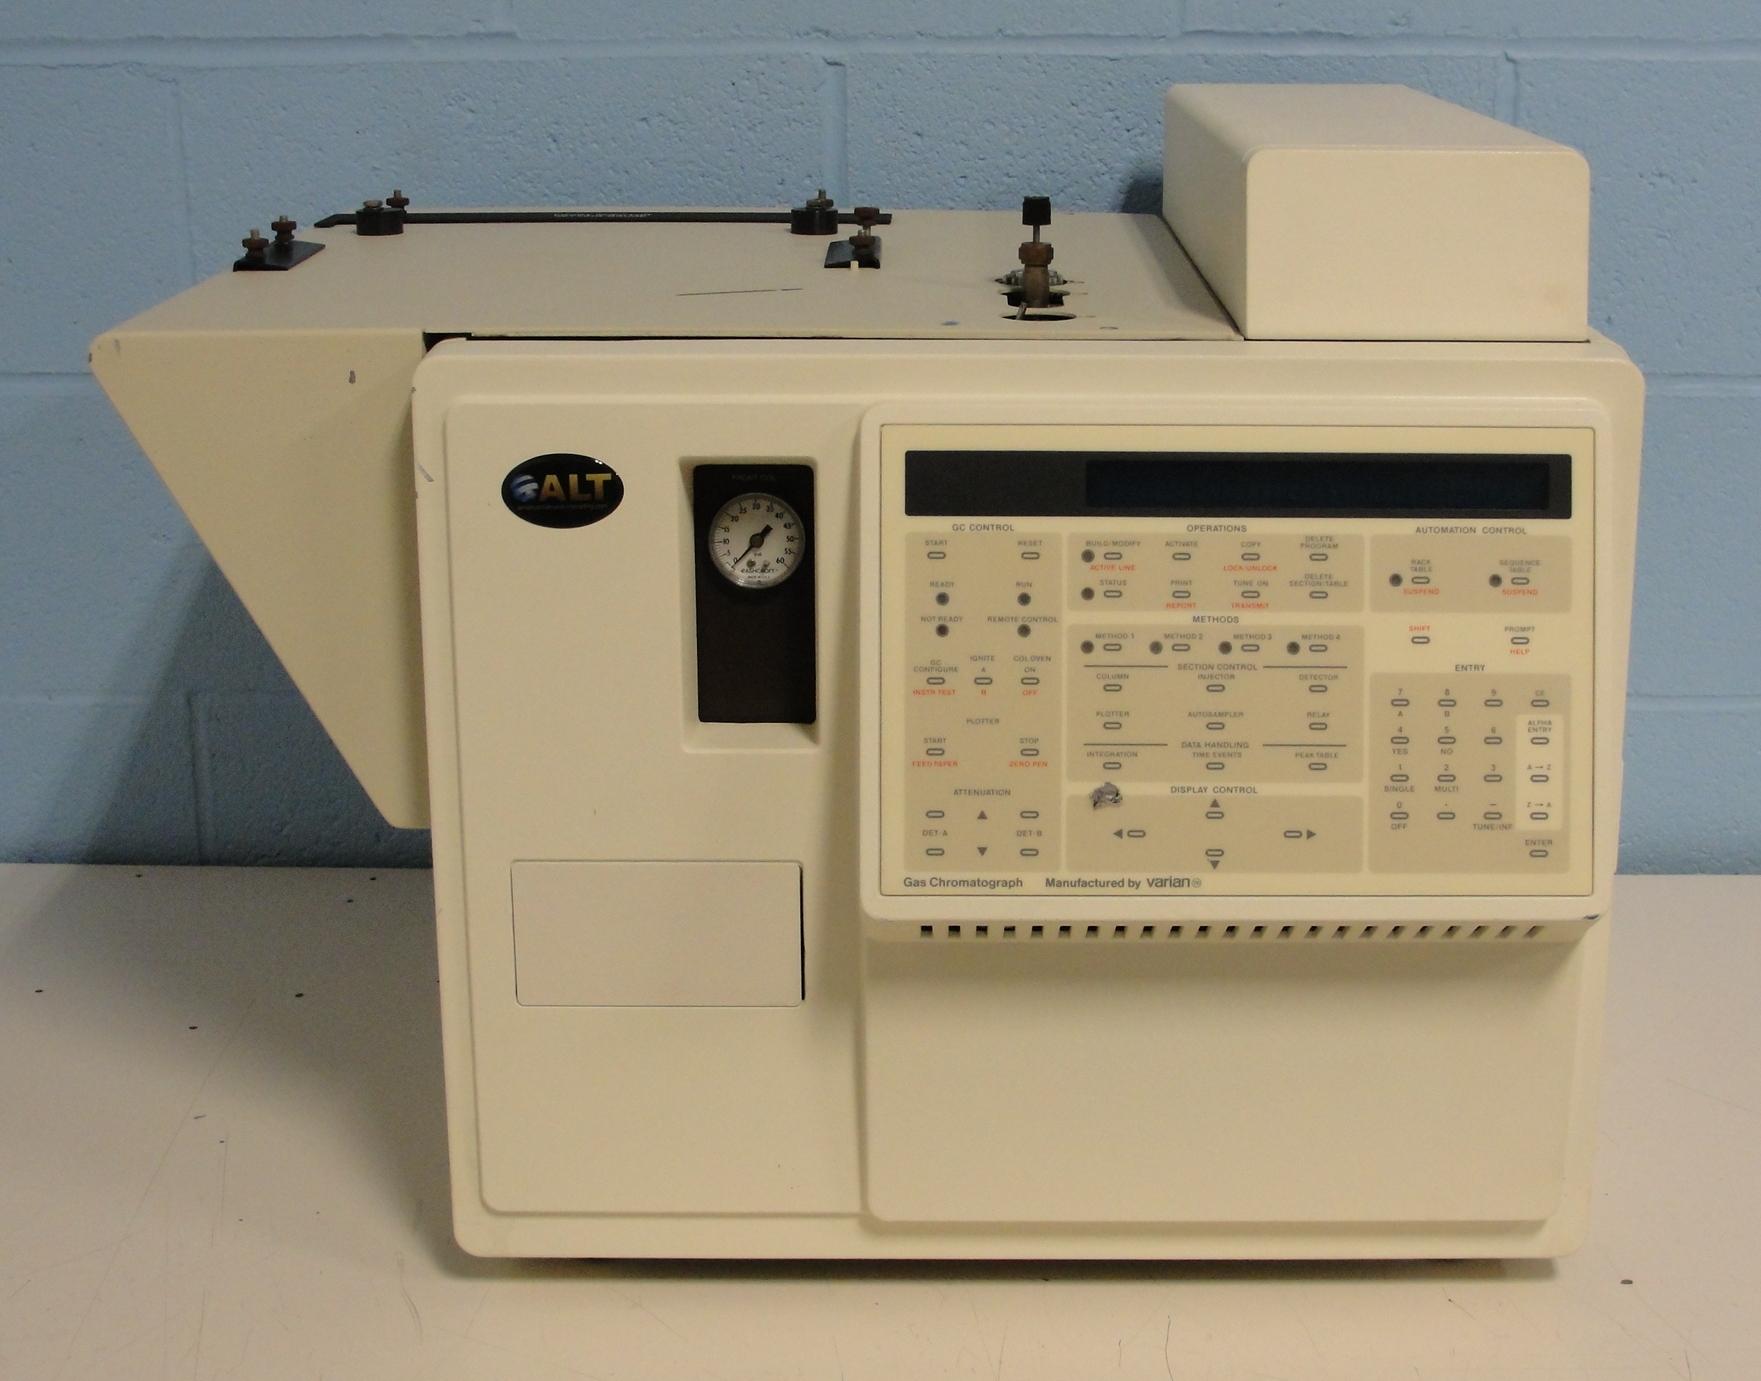 Refurbished Varian Gas Chromatograph